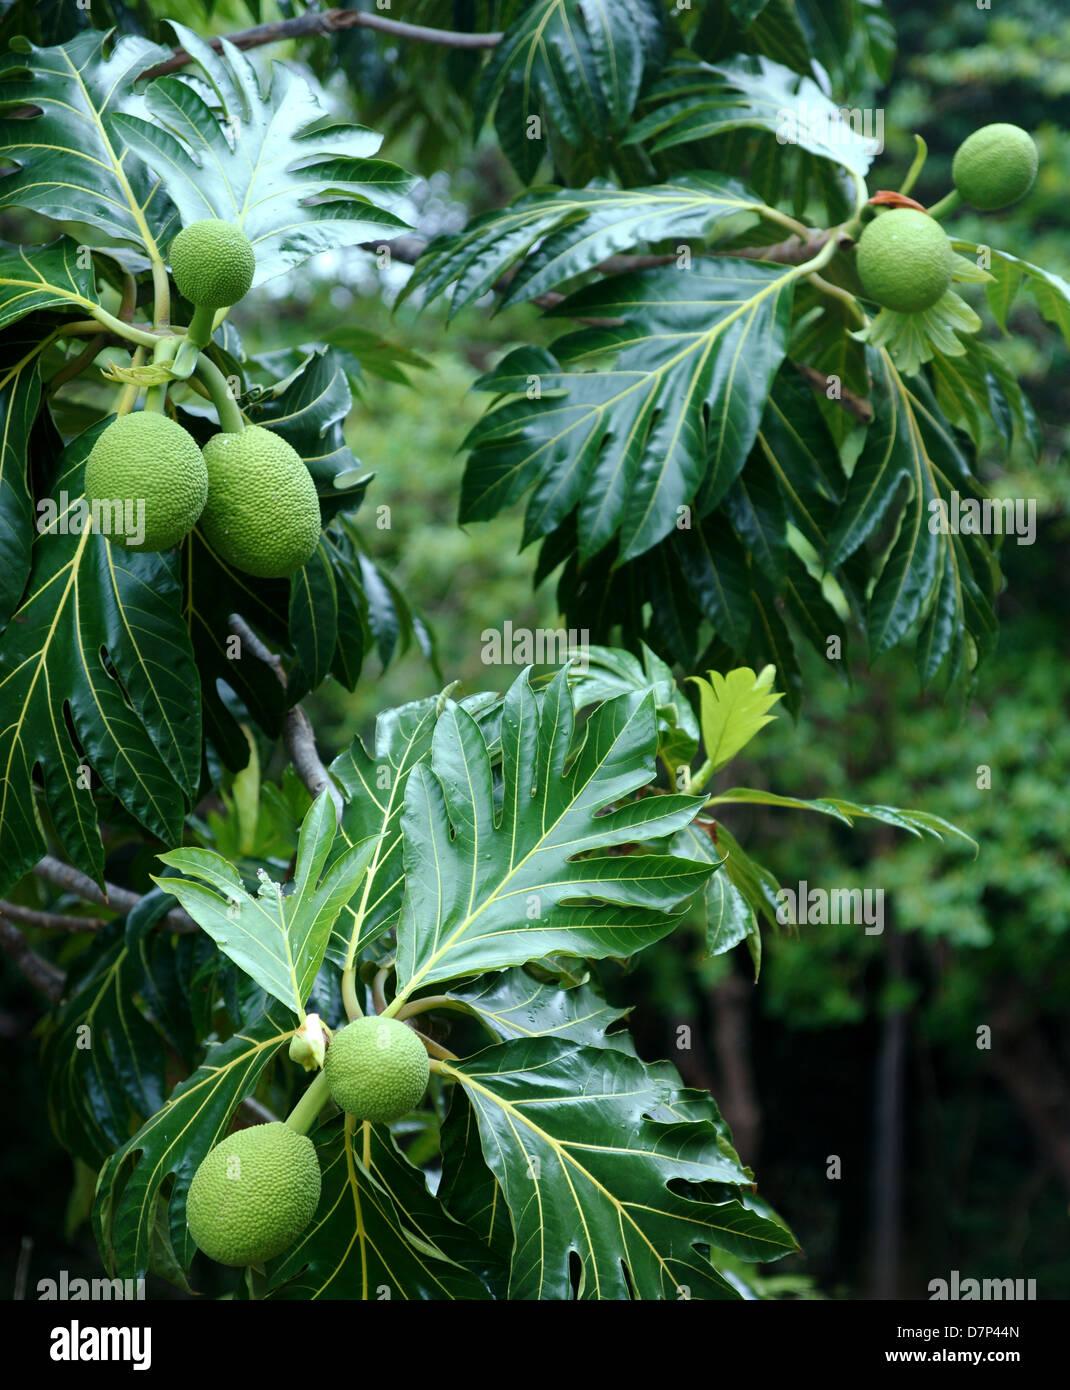 Brotfruchtbaum (Artocarpus Altilis) im tropischen Regenwald. Puerto Rico. Zentralamerika Stockbild